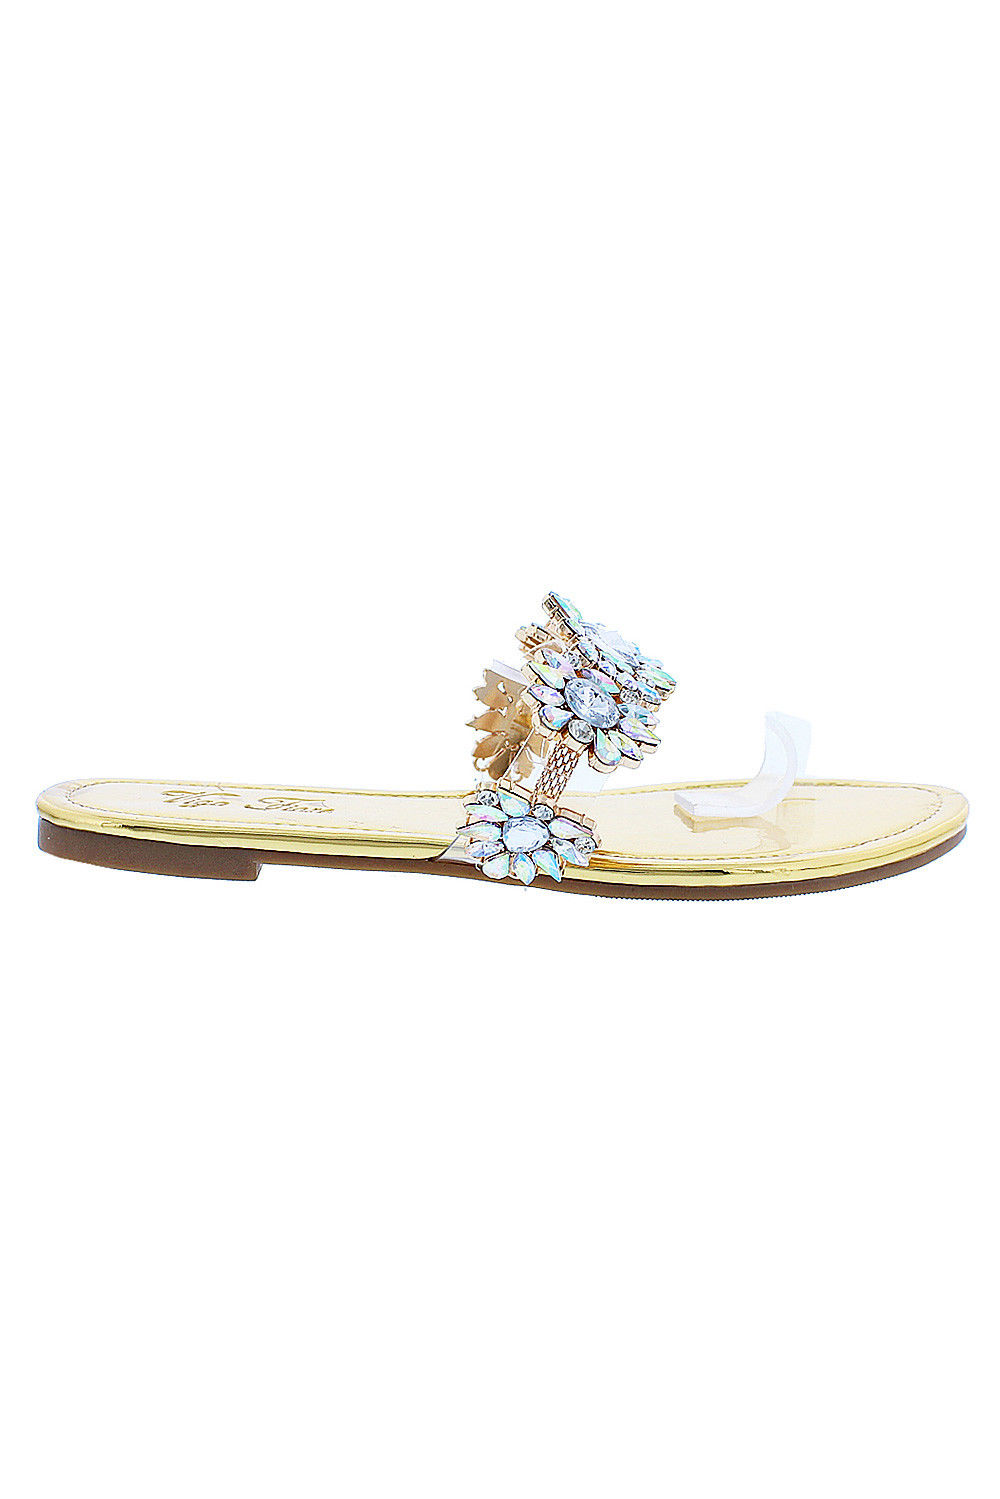 688b510bf702 Genx - Womens Summer Crystal Rhinestone Flip Flops Sandals AURORA-264-8.5- Black - Walmart.com